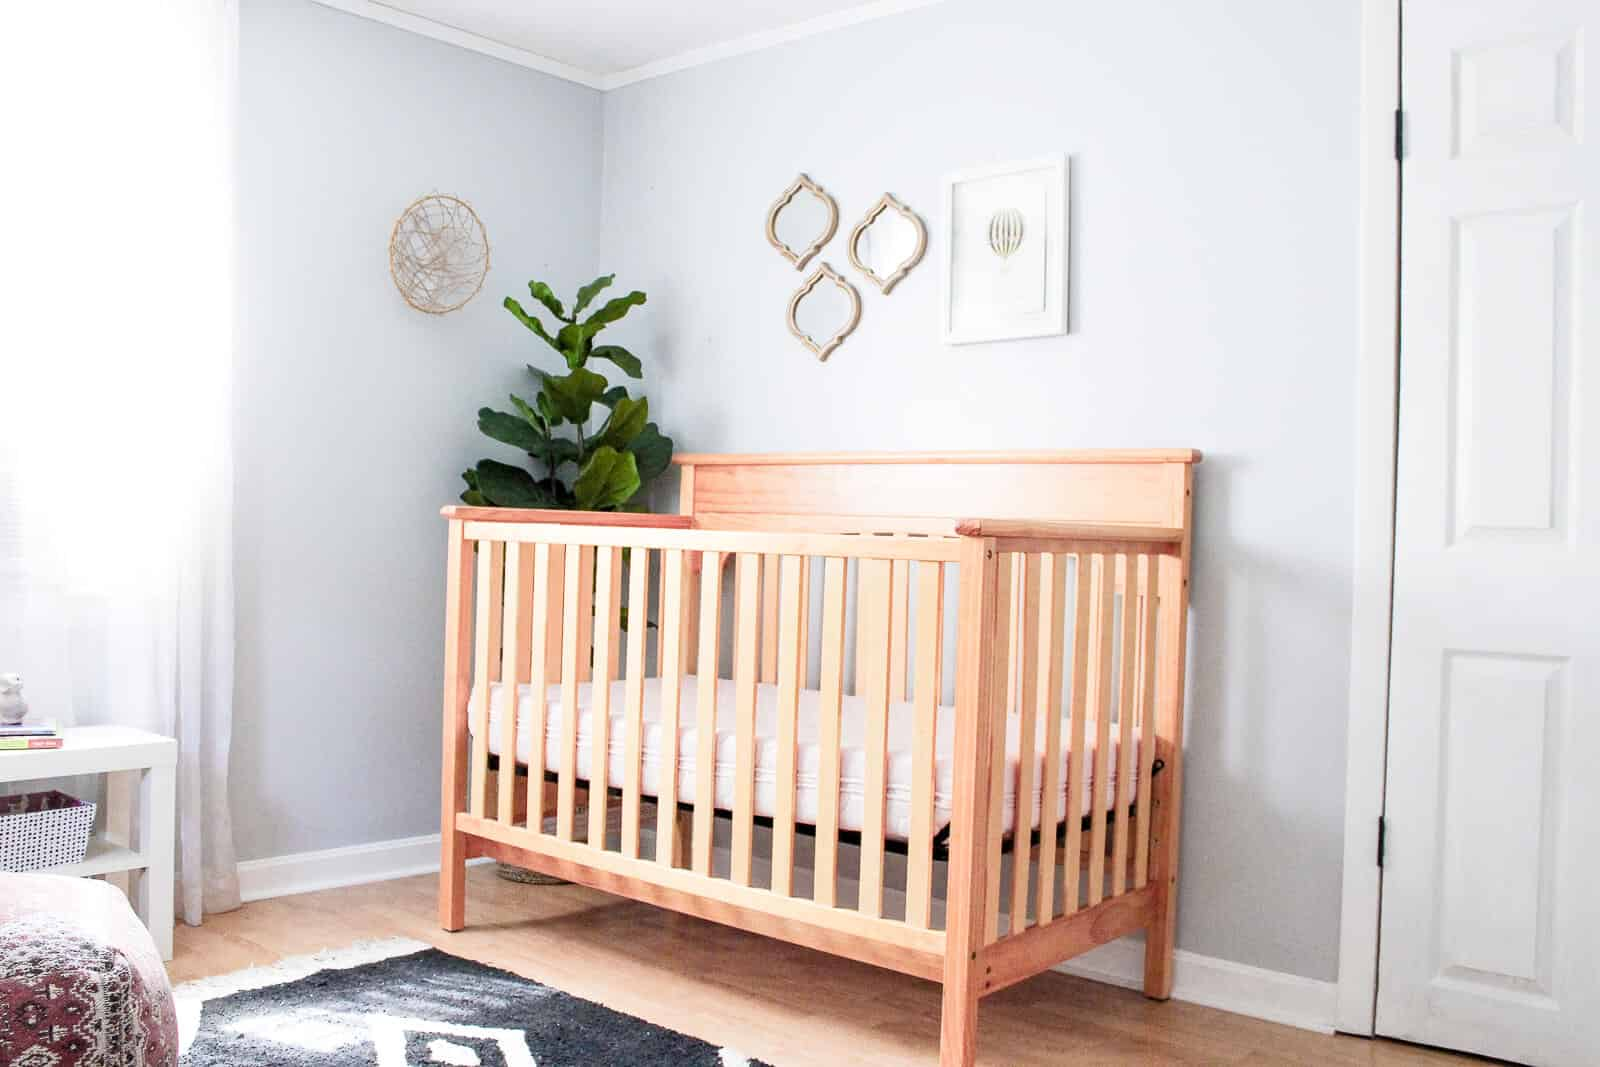 Toddler Room Decor